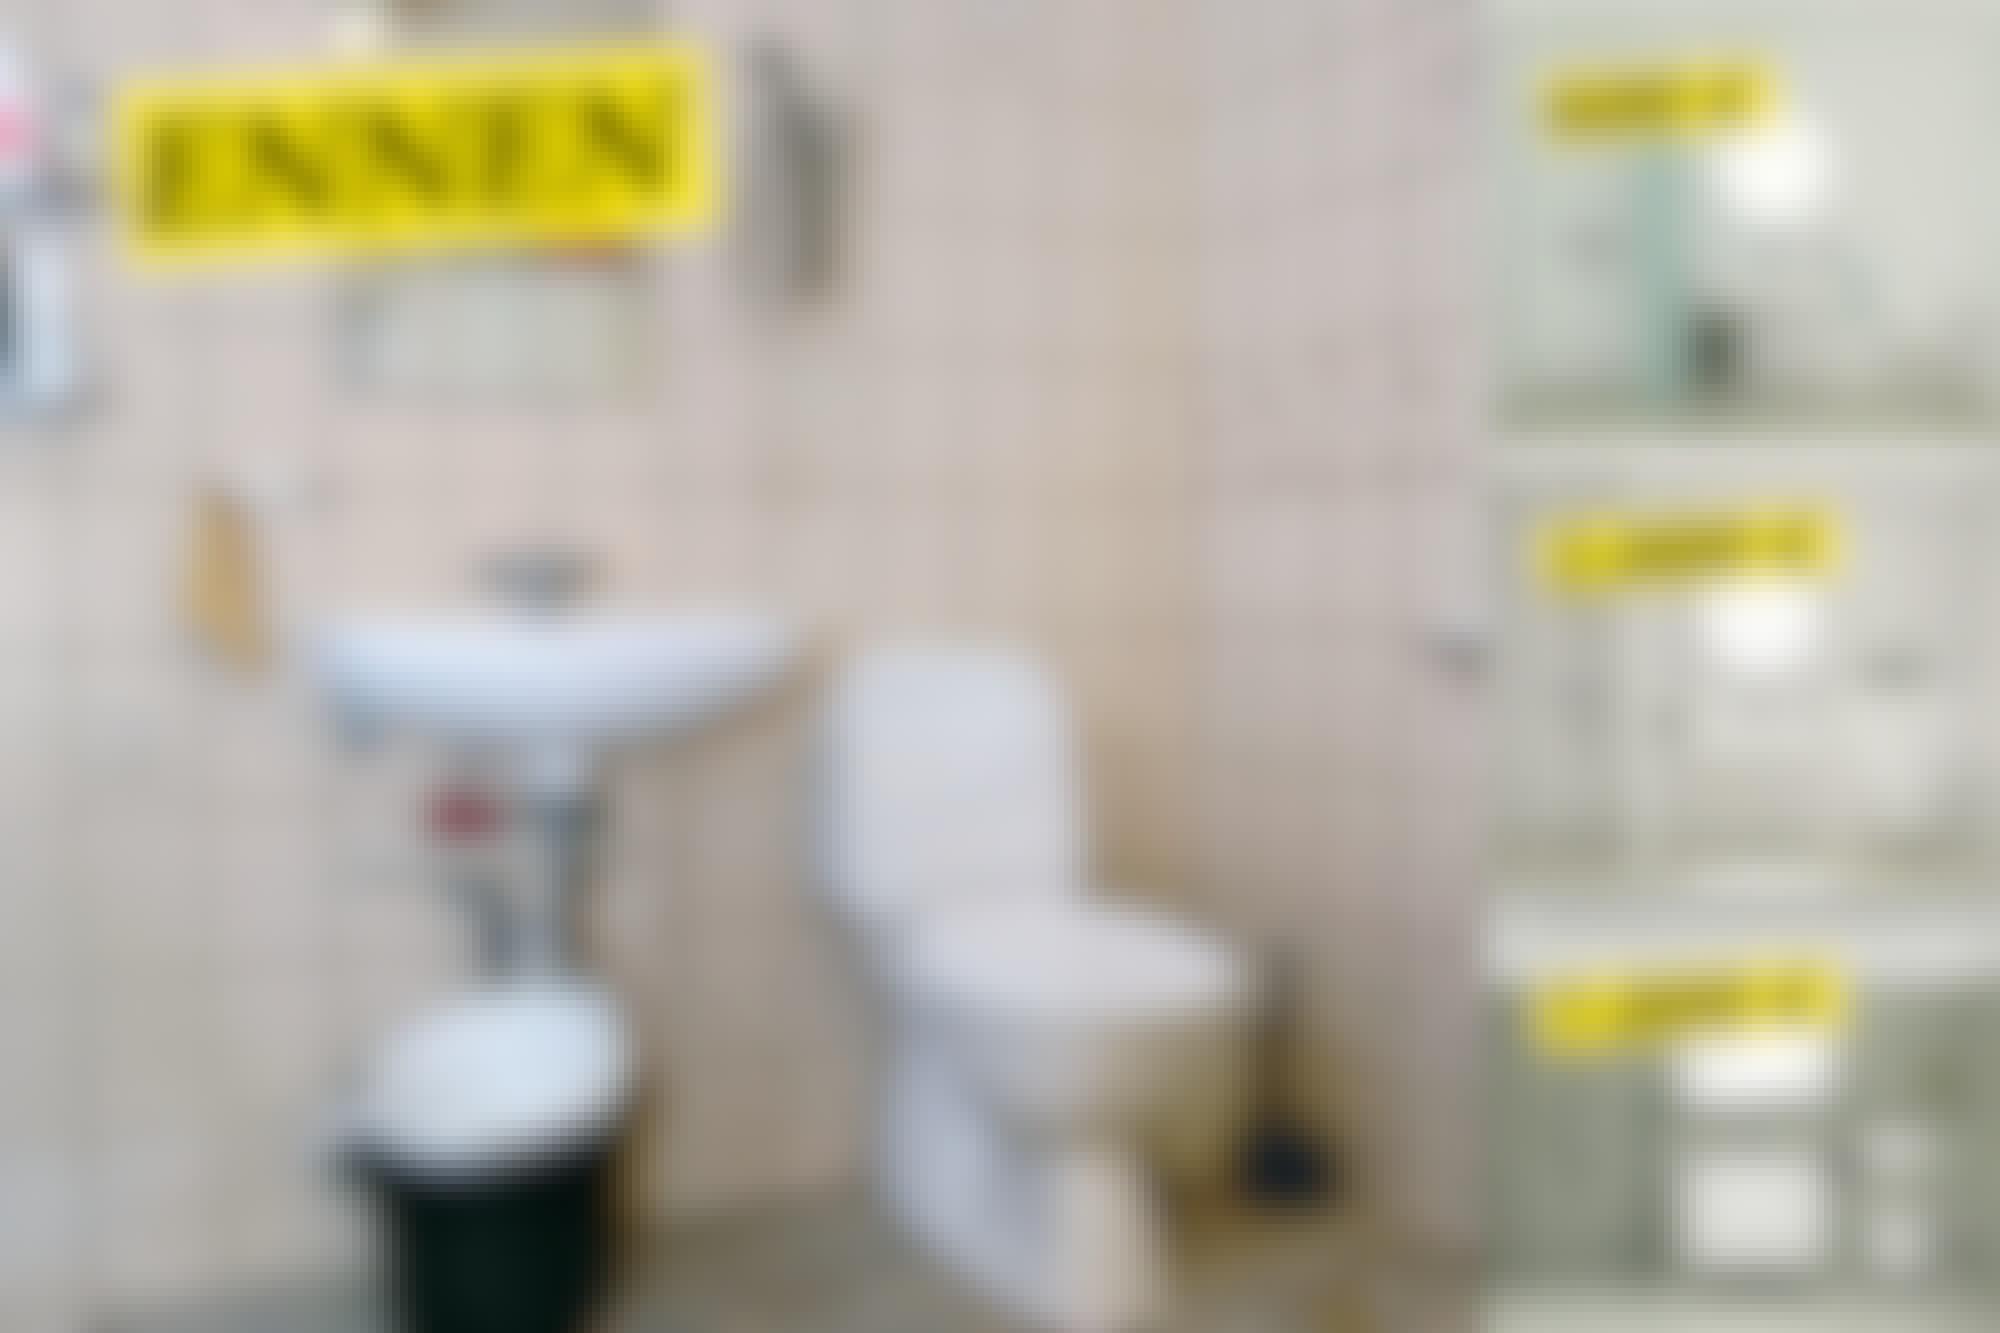 Uusi kylpyhuone, 3 remonttia